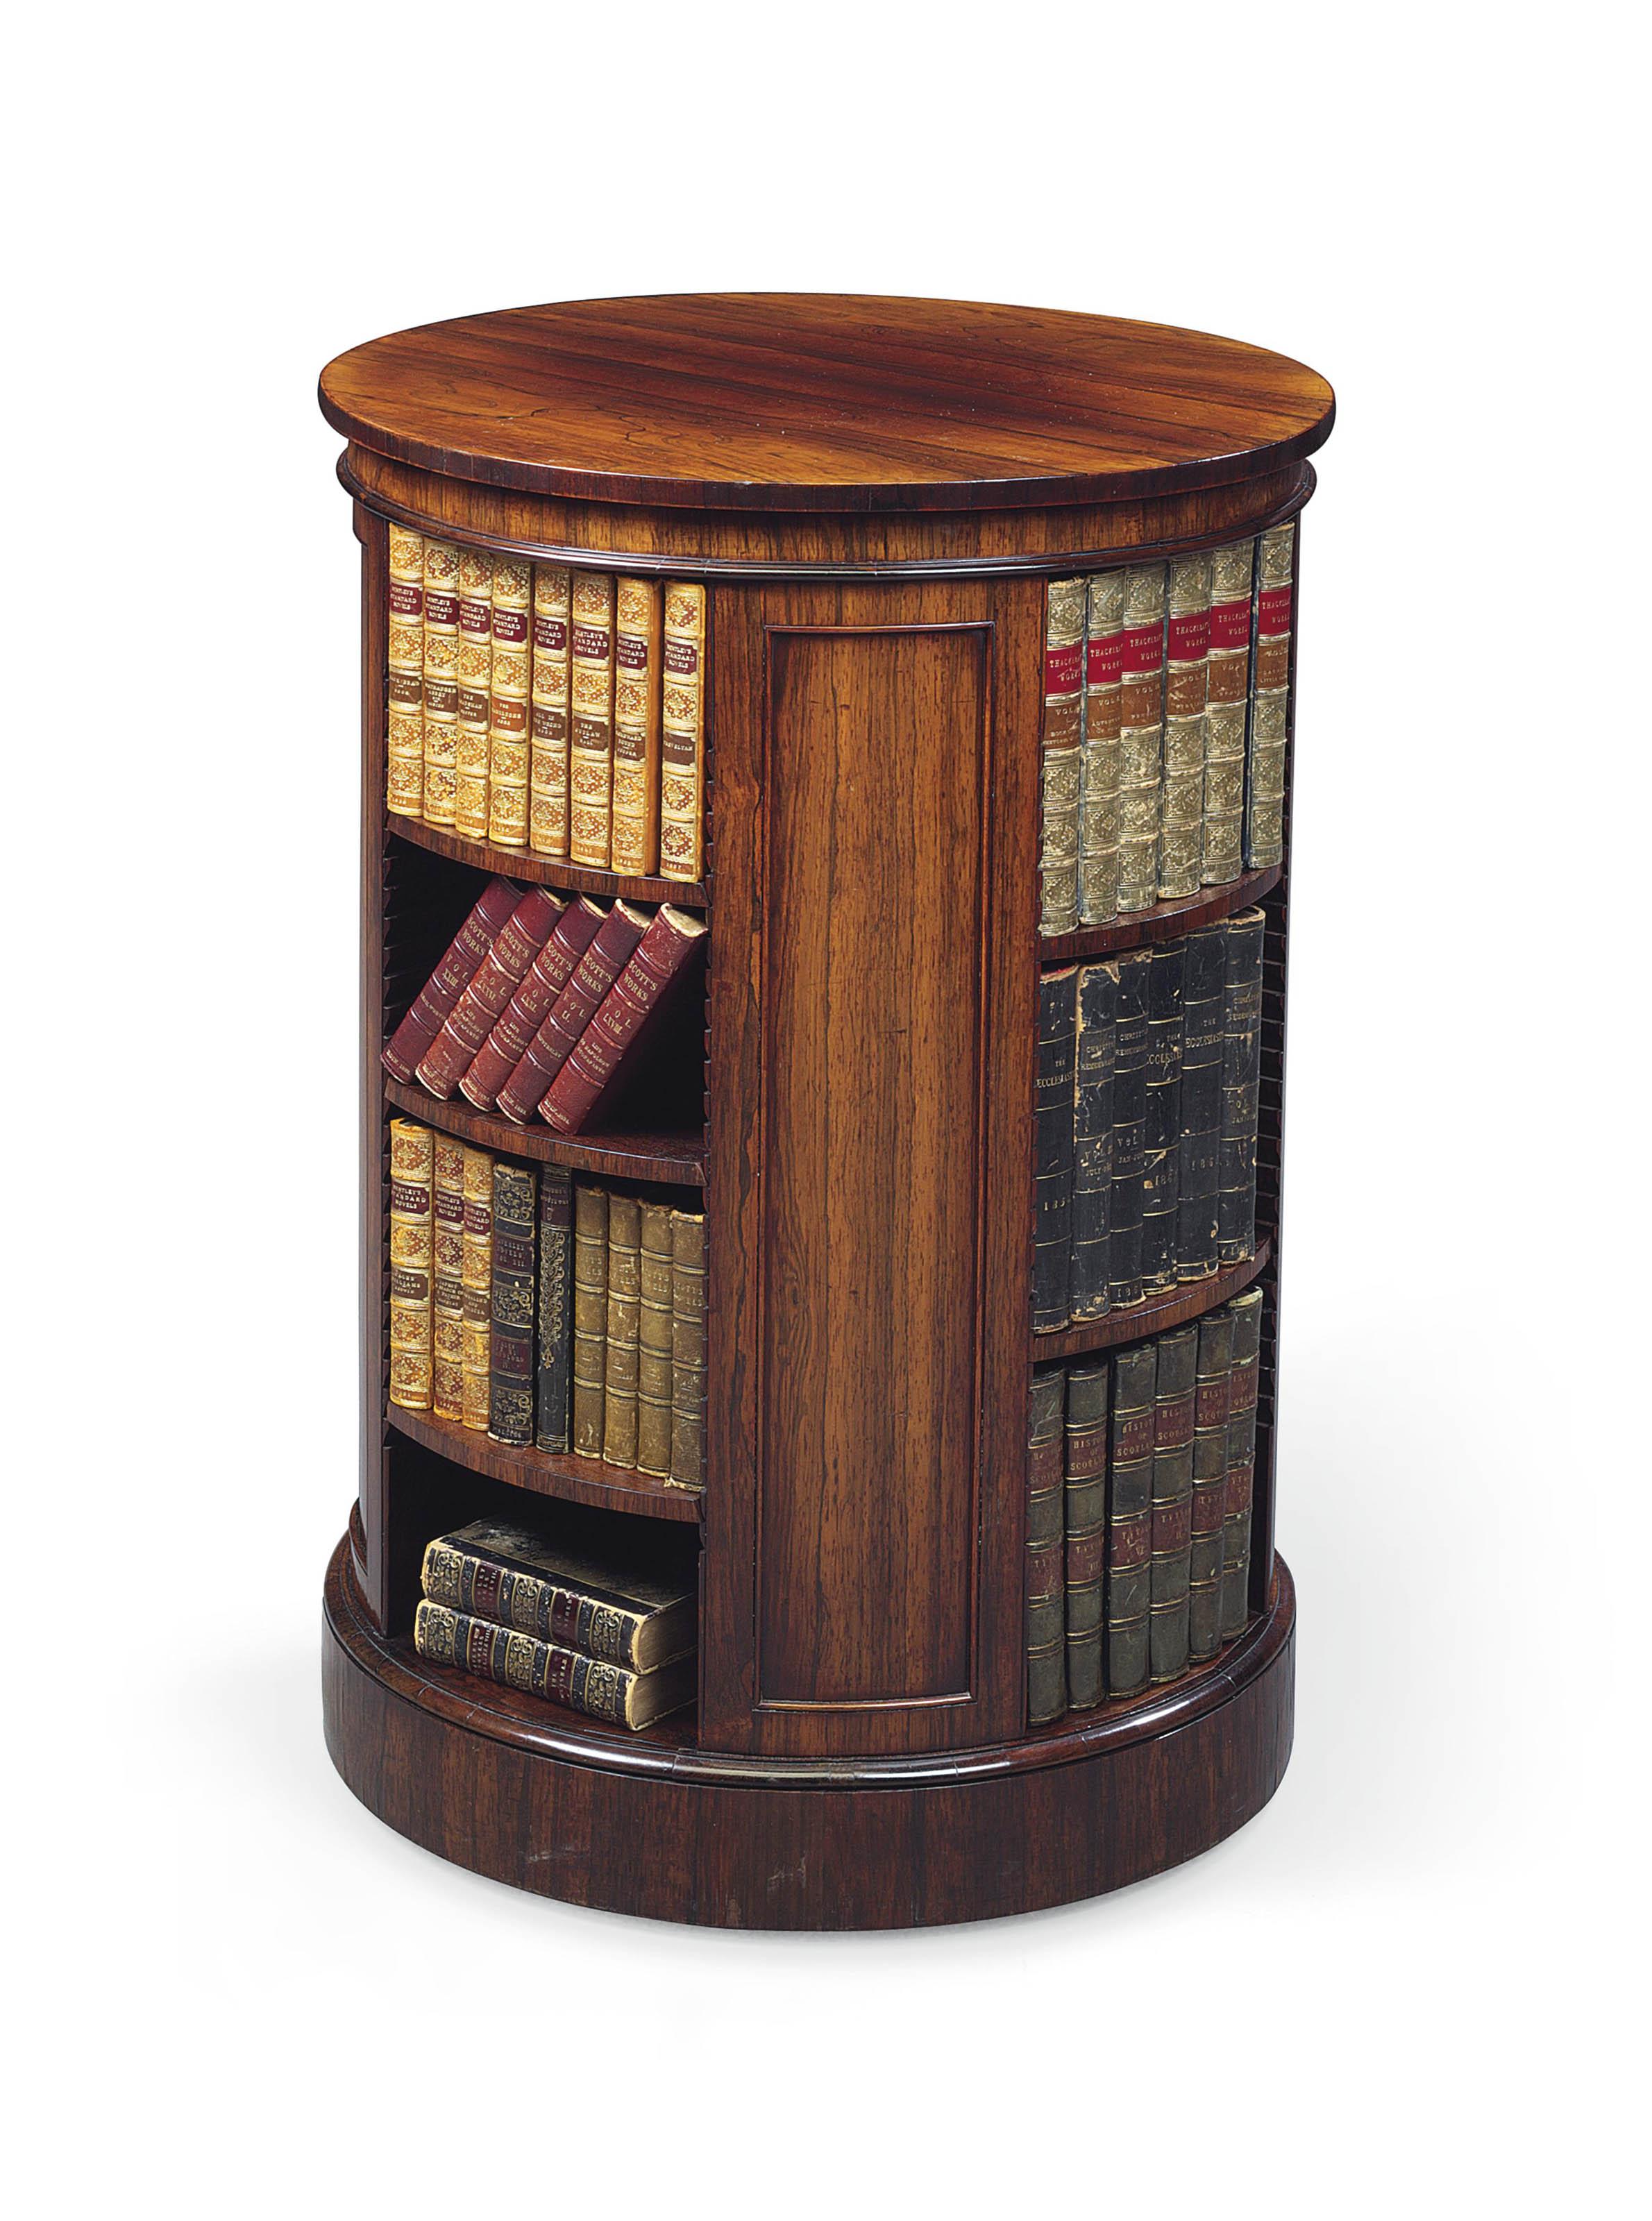 ladder category market shelf world furniture office bookcase two circular bookshelves wood home do farmhouse bookcases xxx